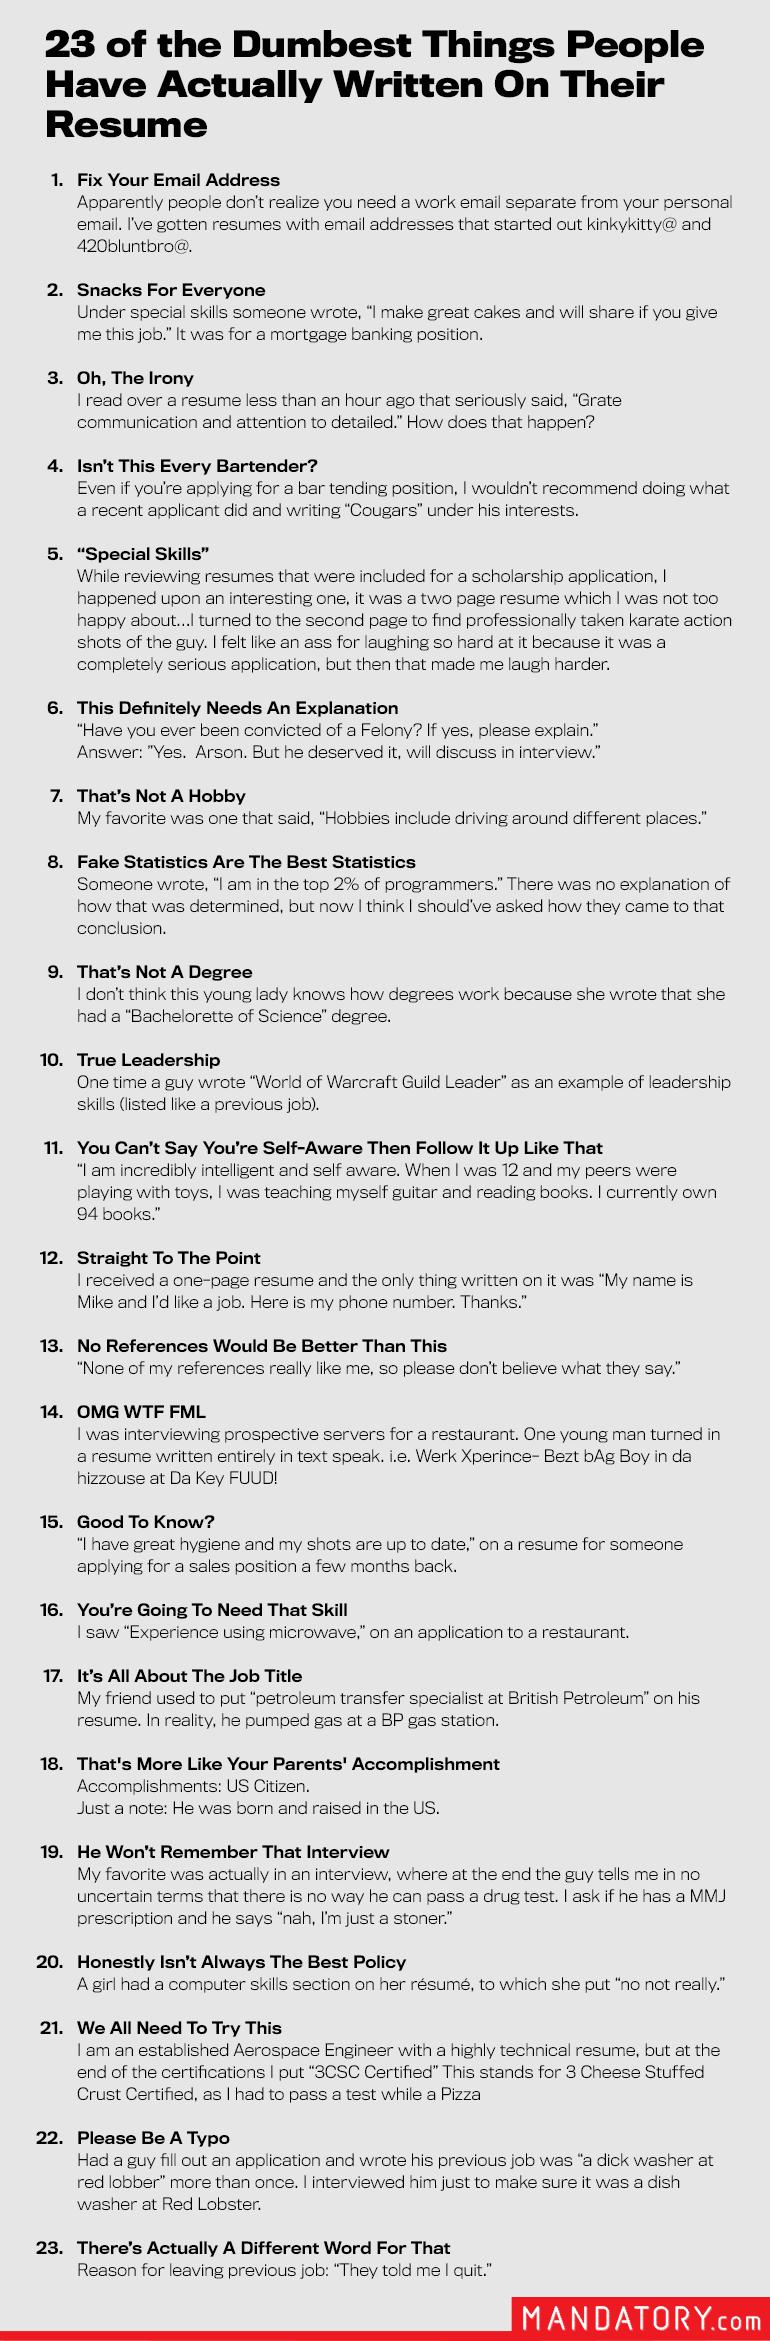 23 of the Dumbest Things People